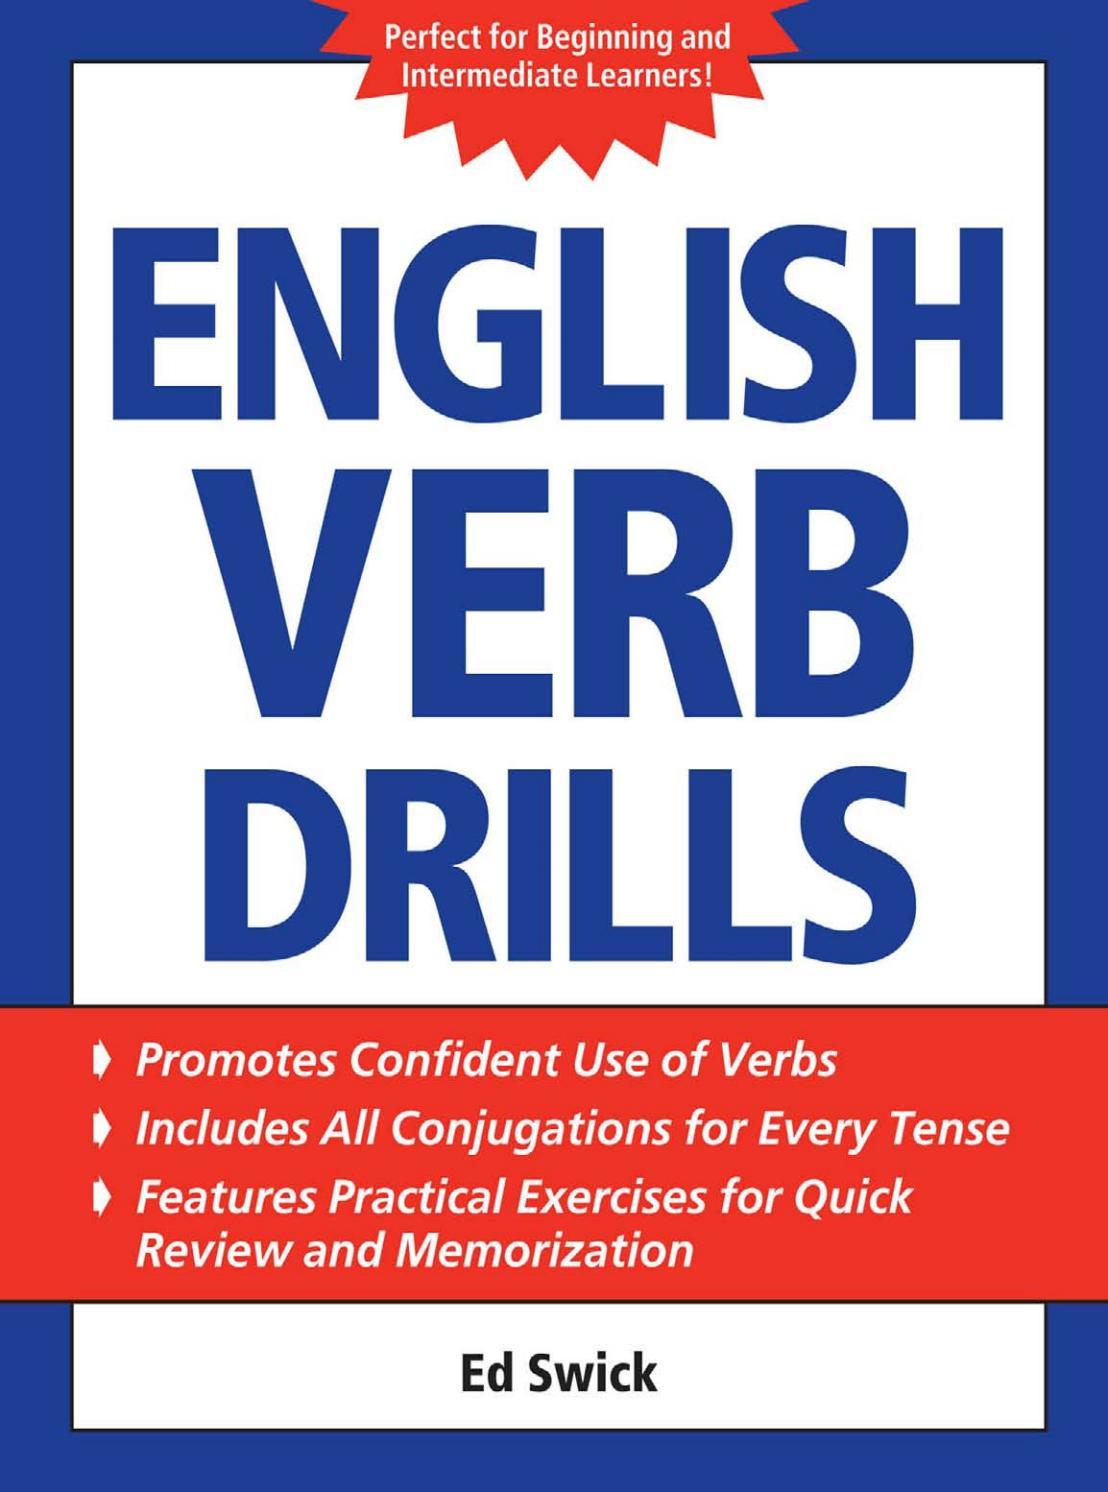 English Verb Drills By Mayarasblog Issuu